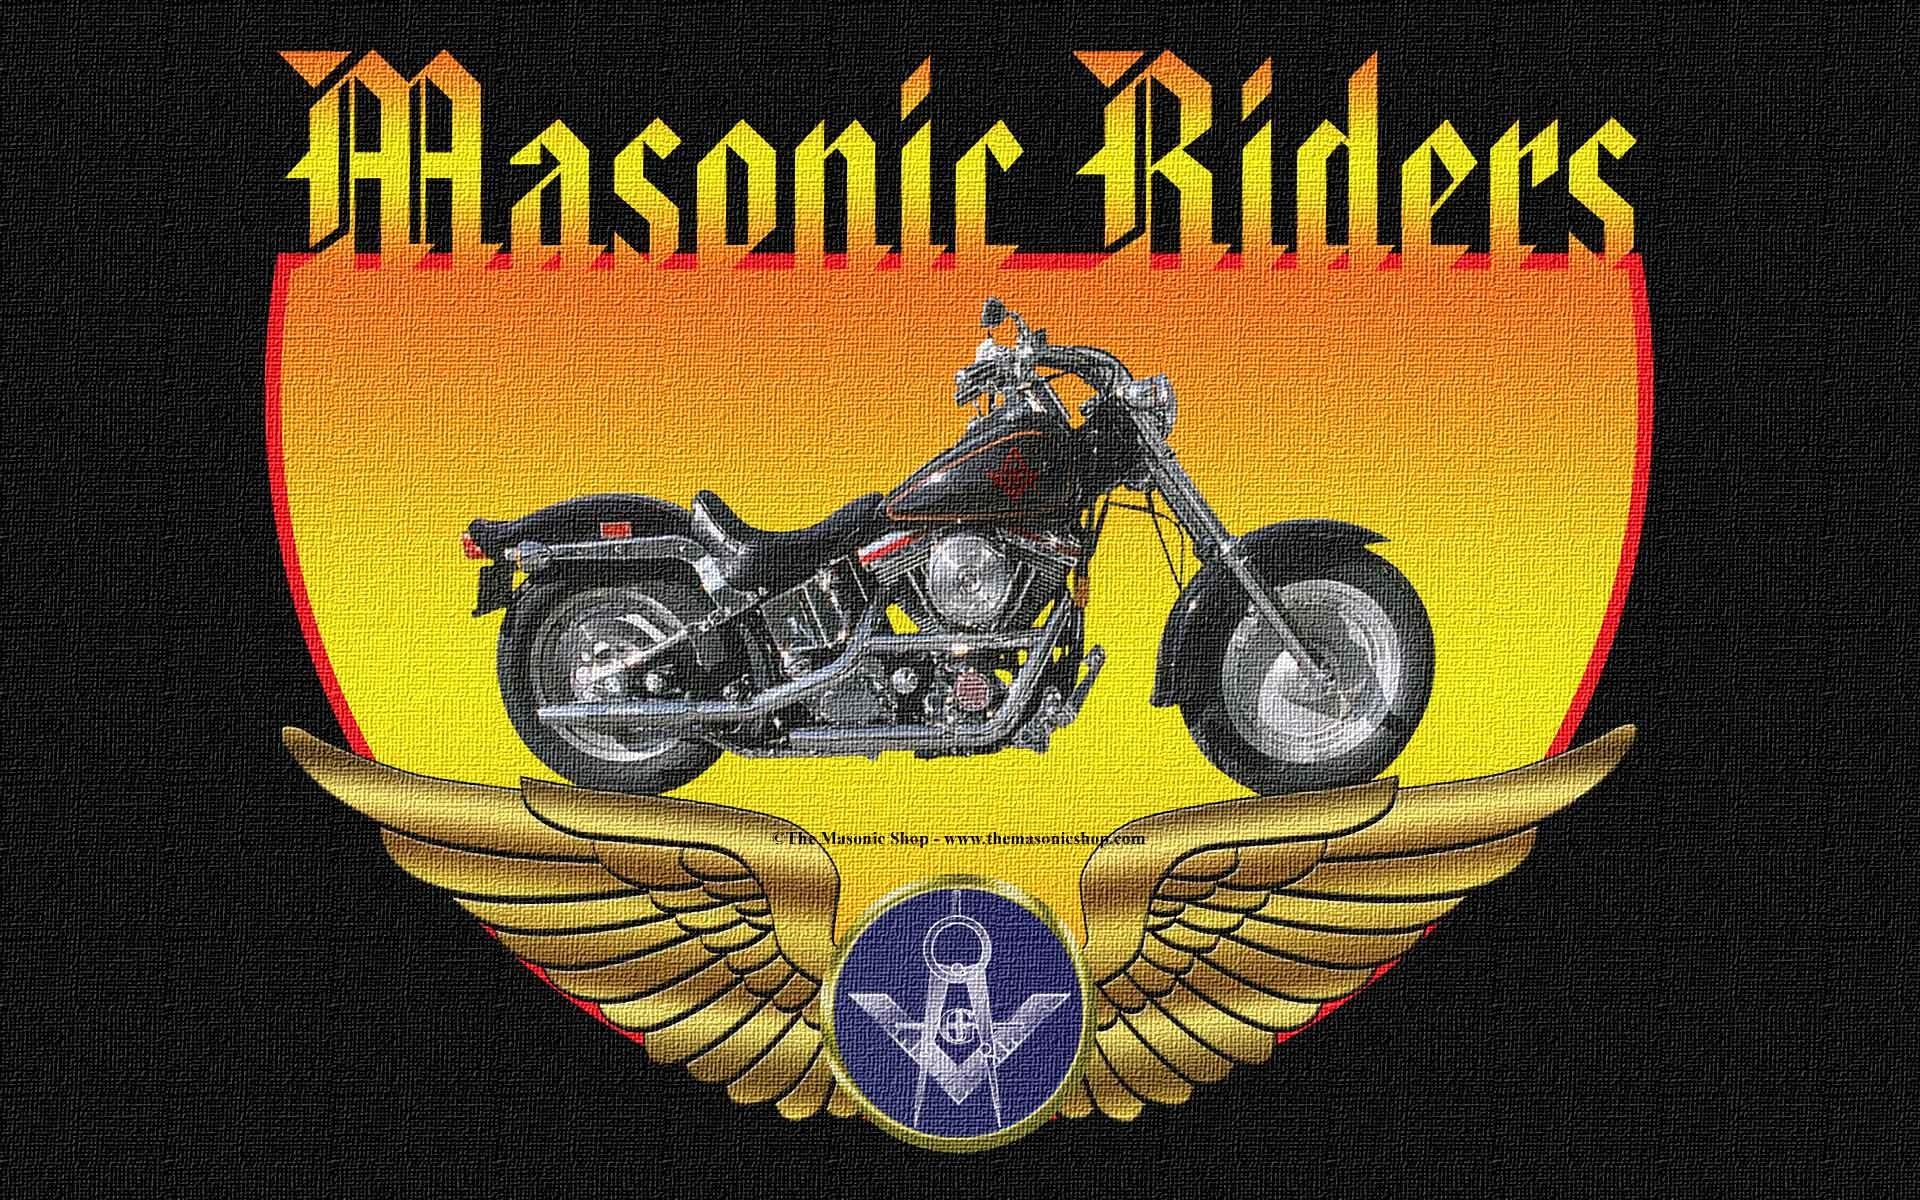 · Masonic Motorcycle Riders